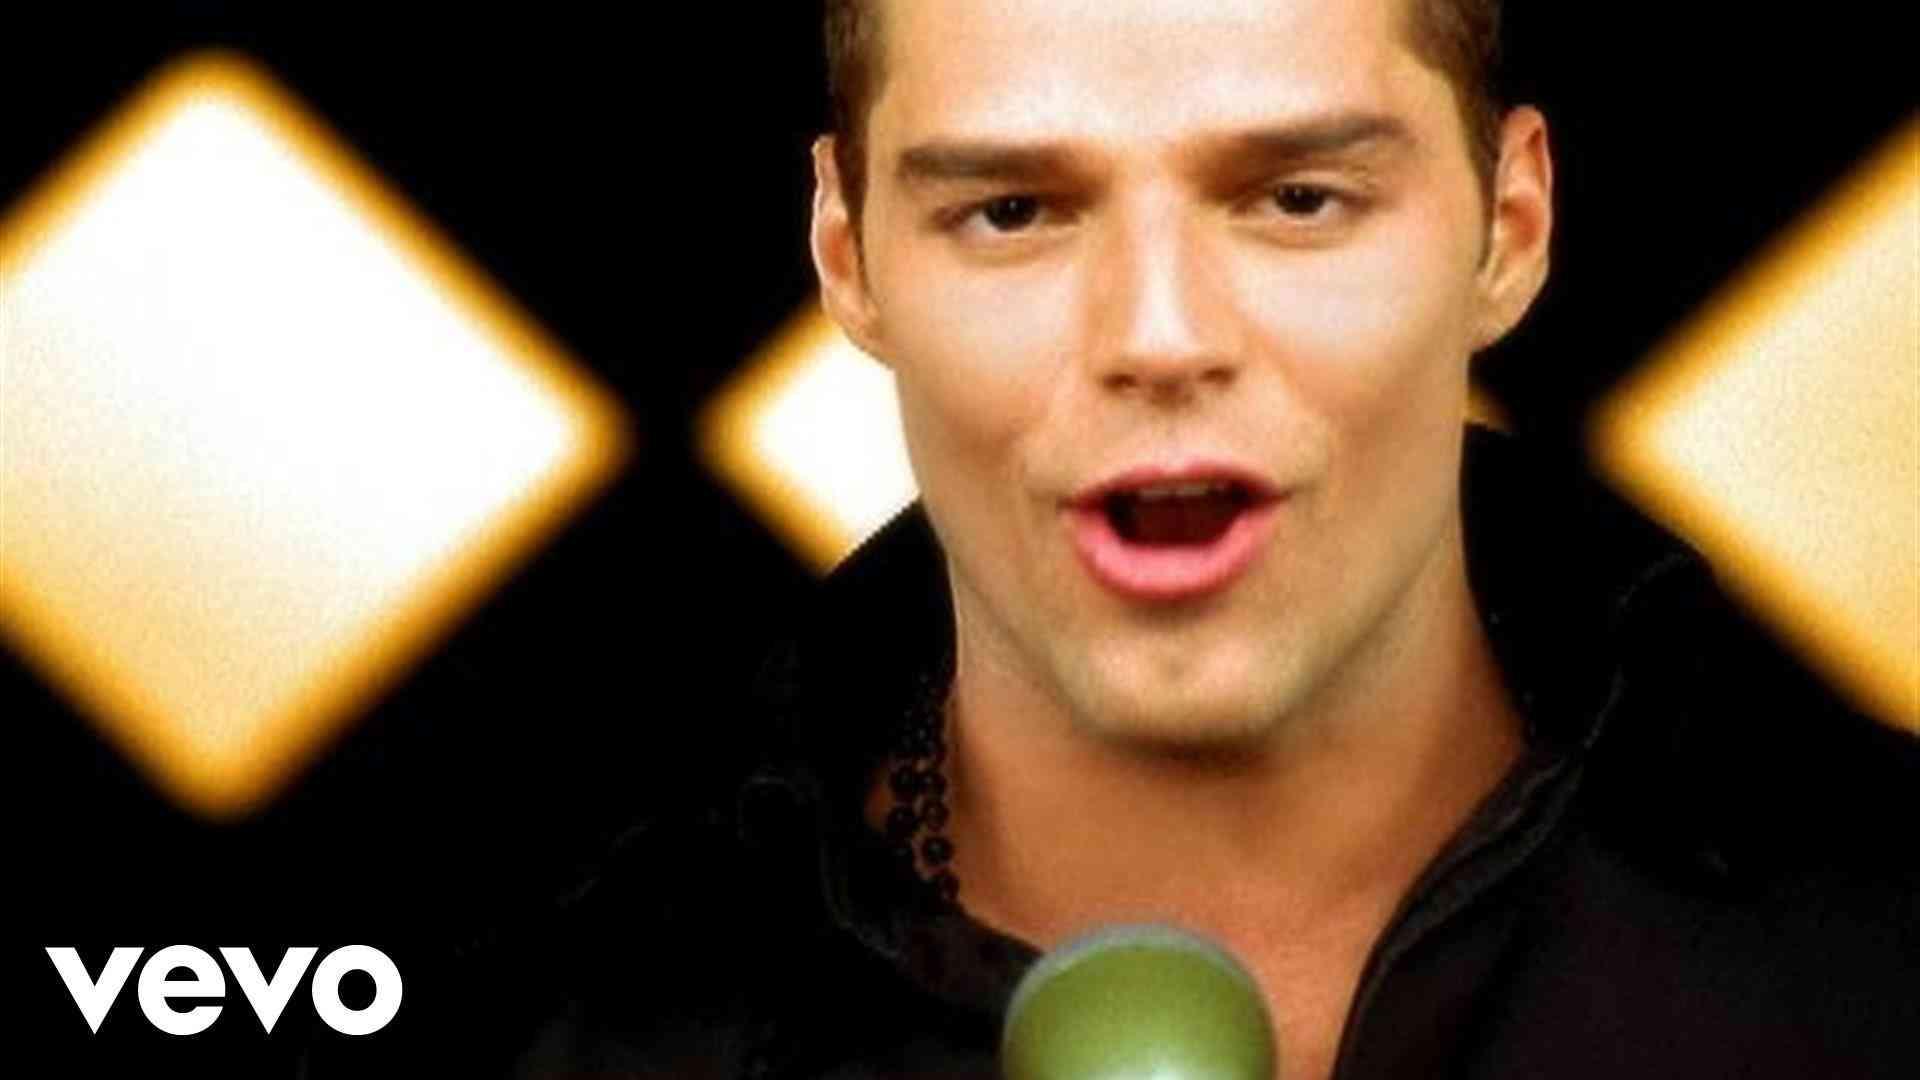 Ricky Martin - Livin' La Vida Loca - YouTube